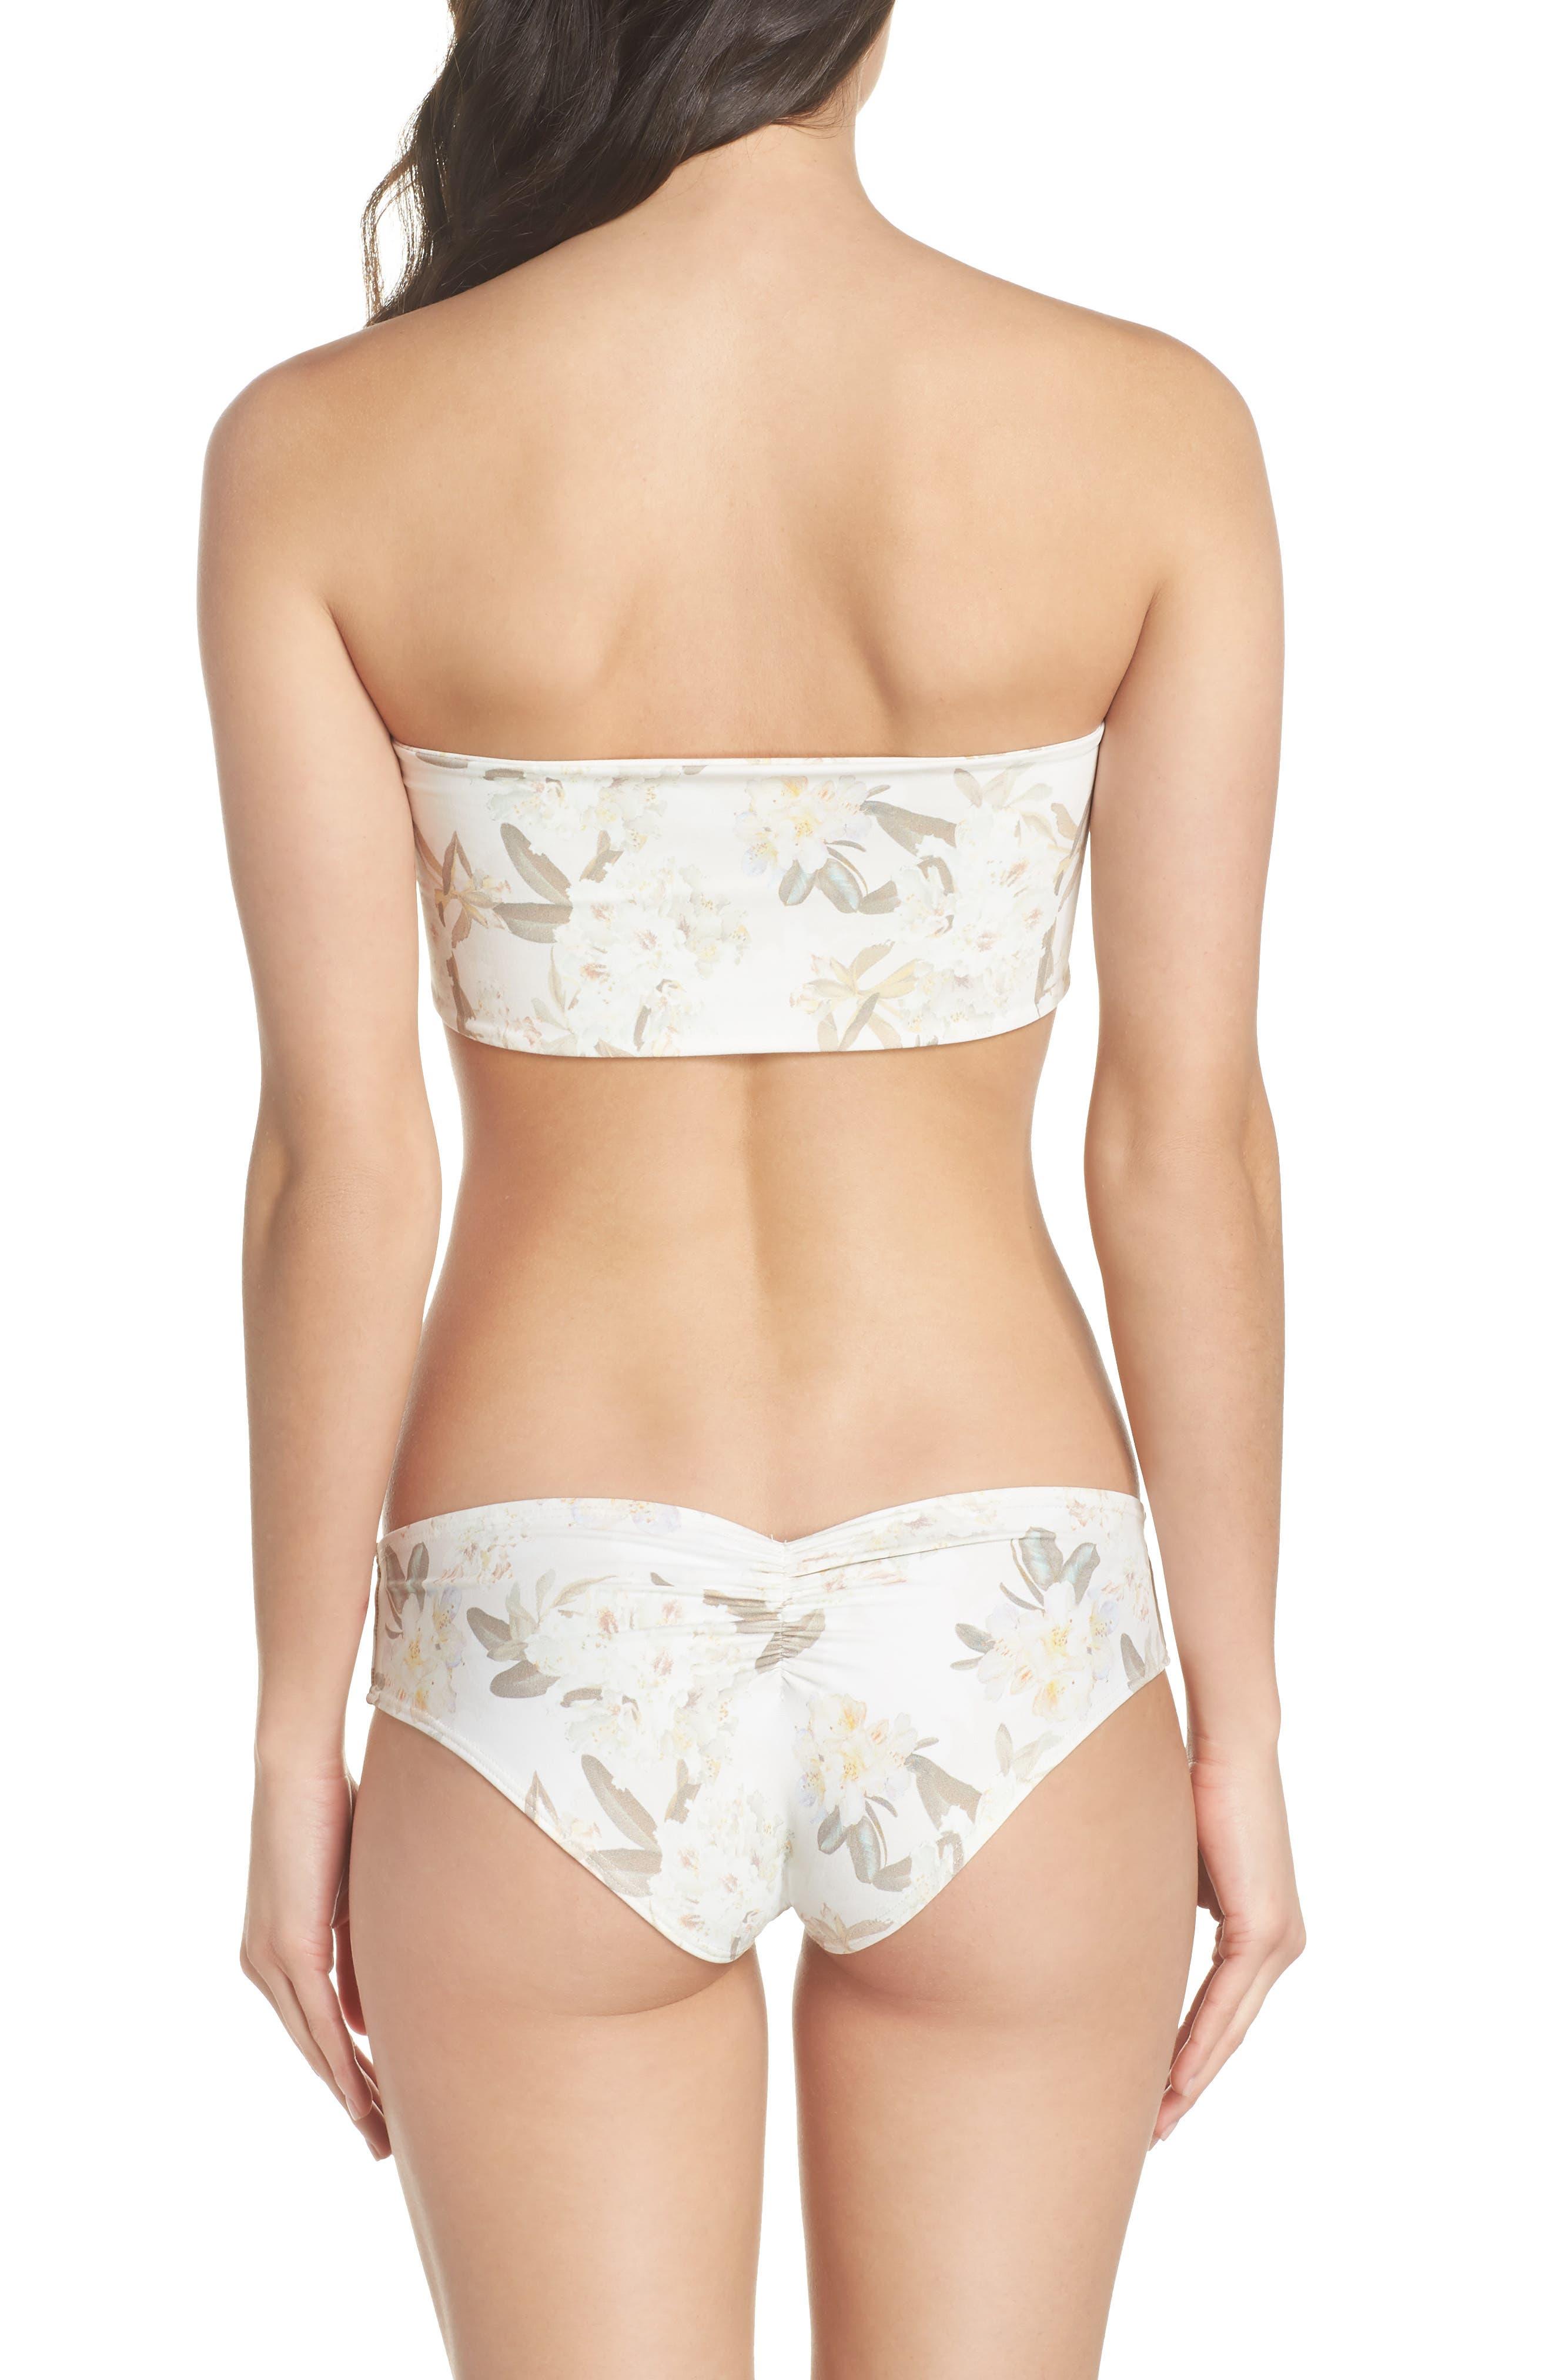 Floral Corset Bikini Top,                             Alternate thumbnail 8, color,                             ETE FLORAL WHITE